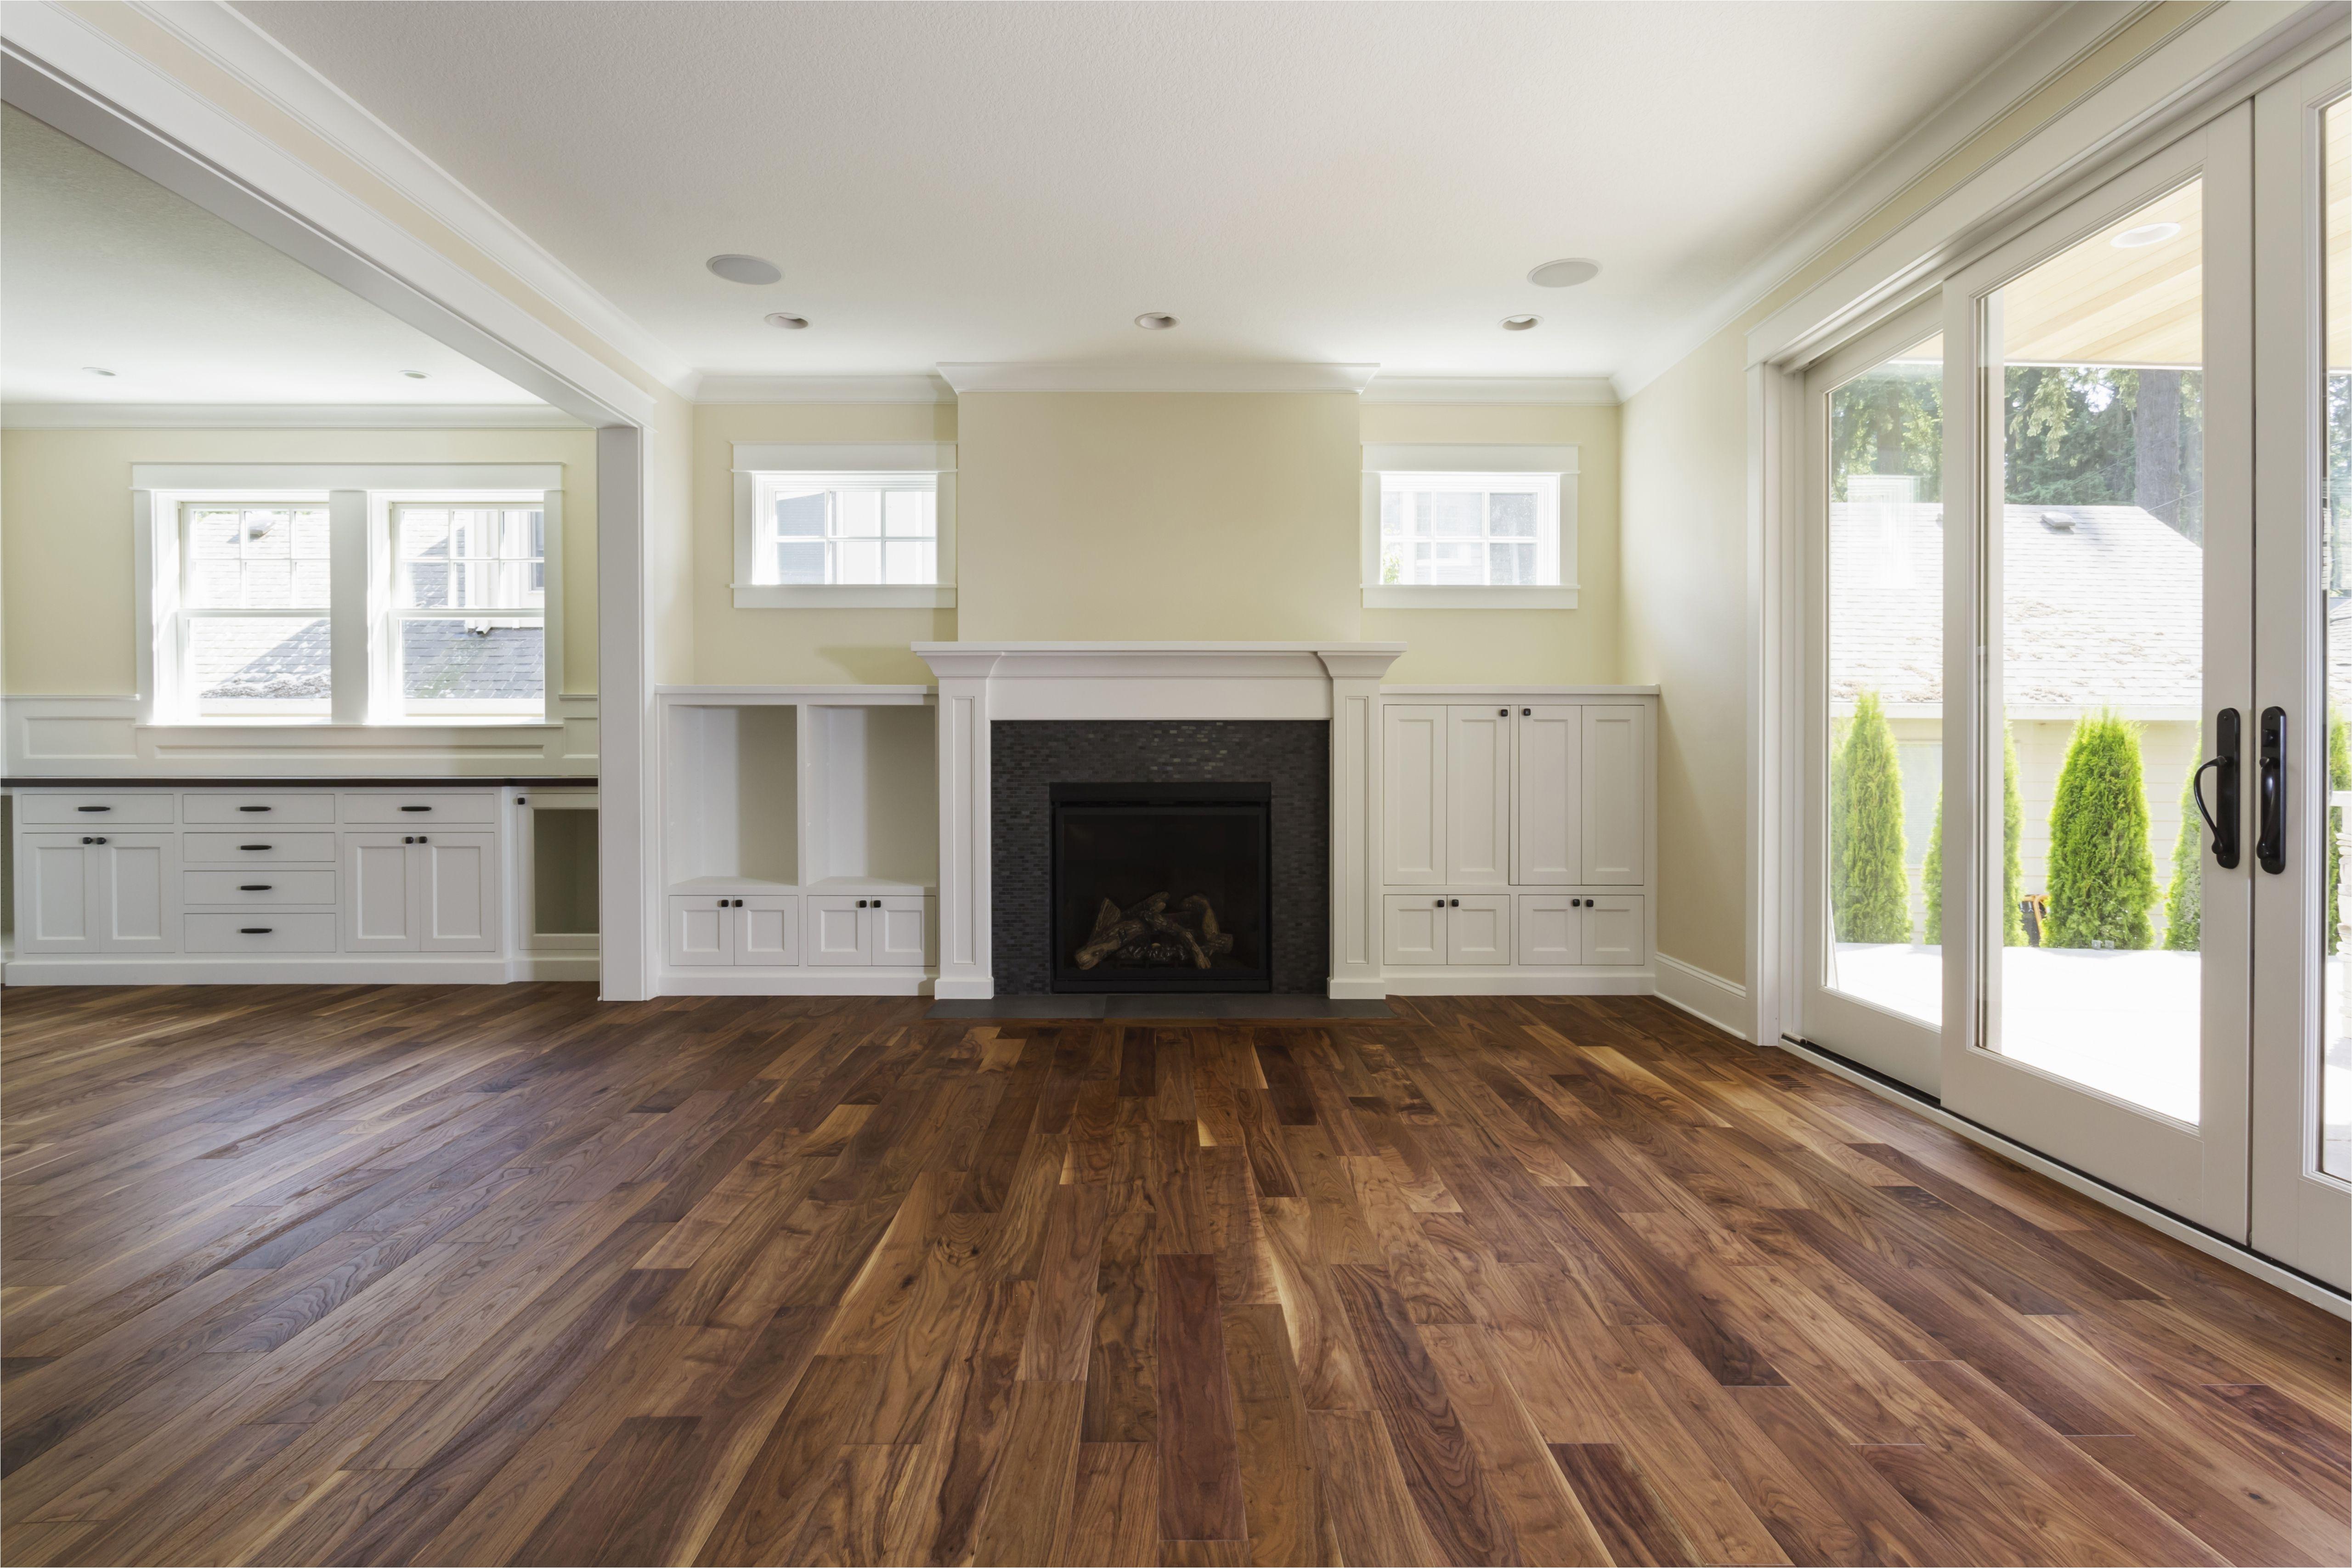 Hardwood Floor Installation atlanta Ga the Pros and Cons Of Prefinished Hardwood Flooring